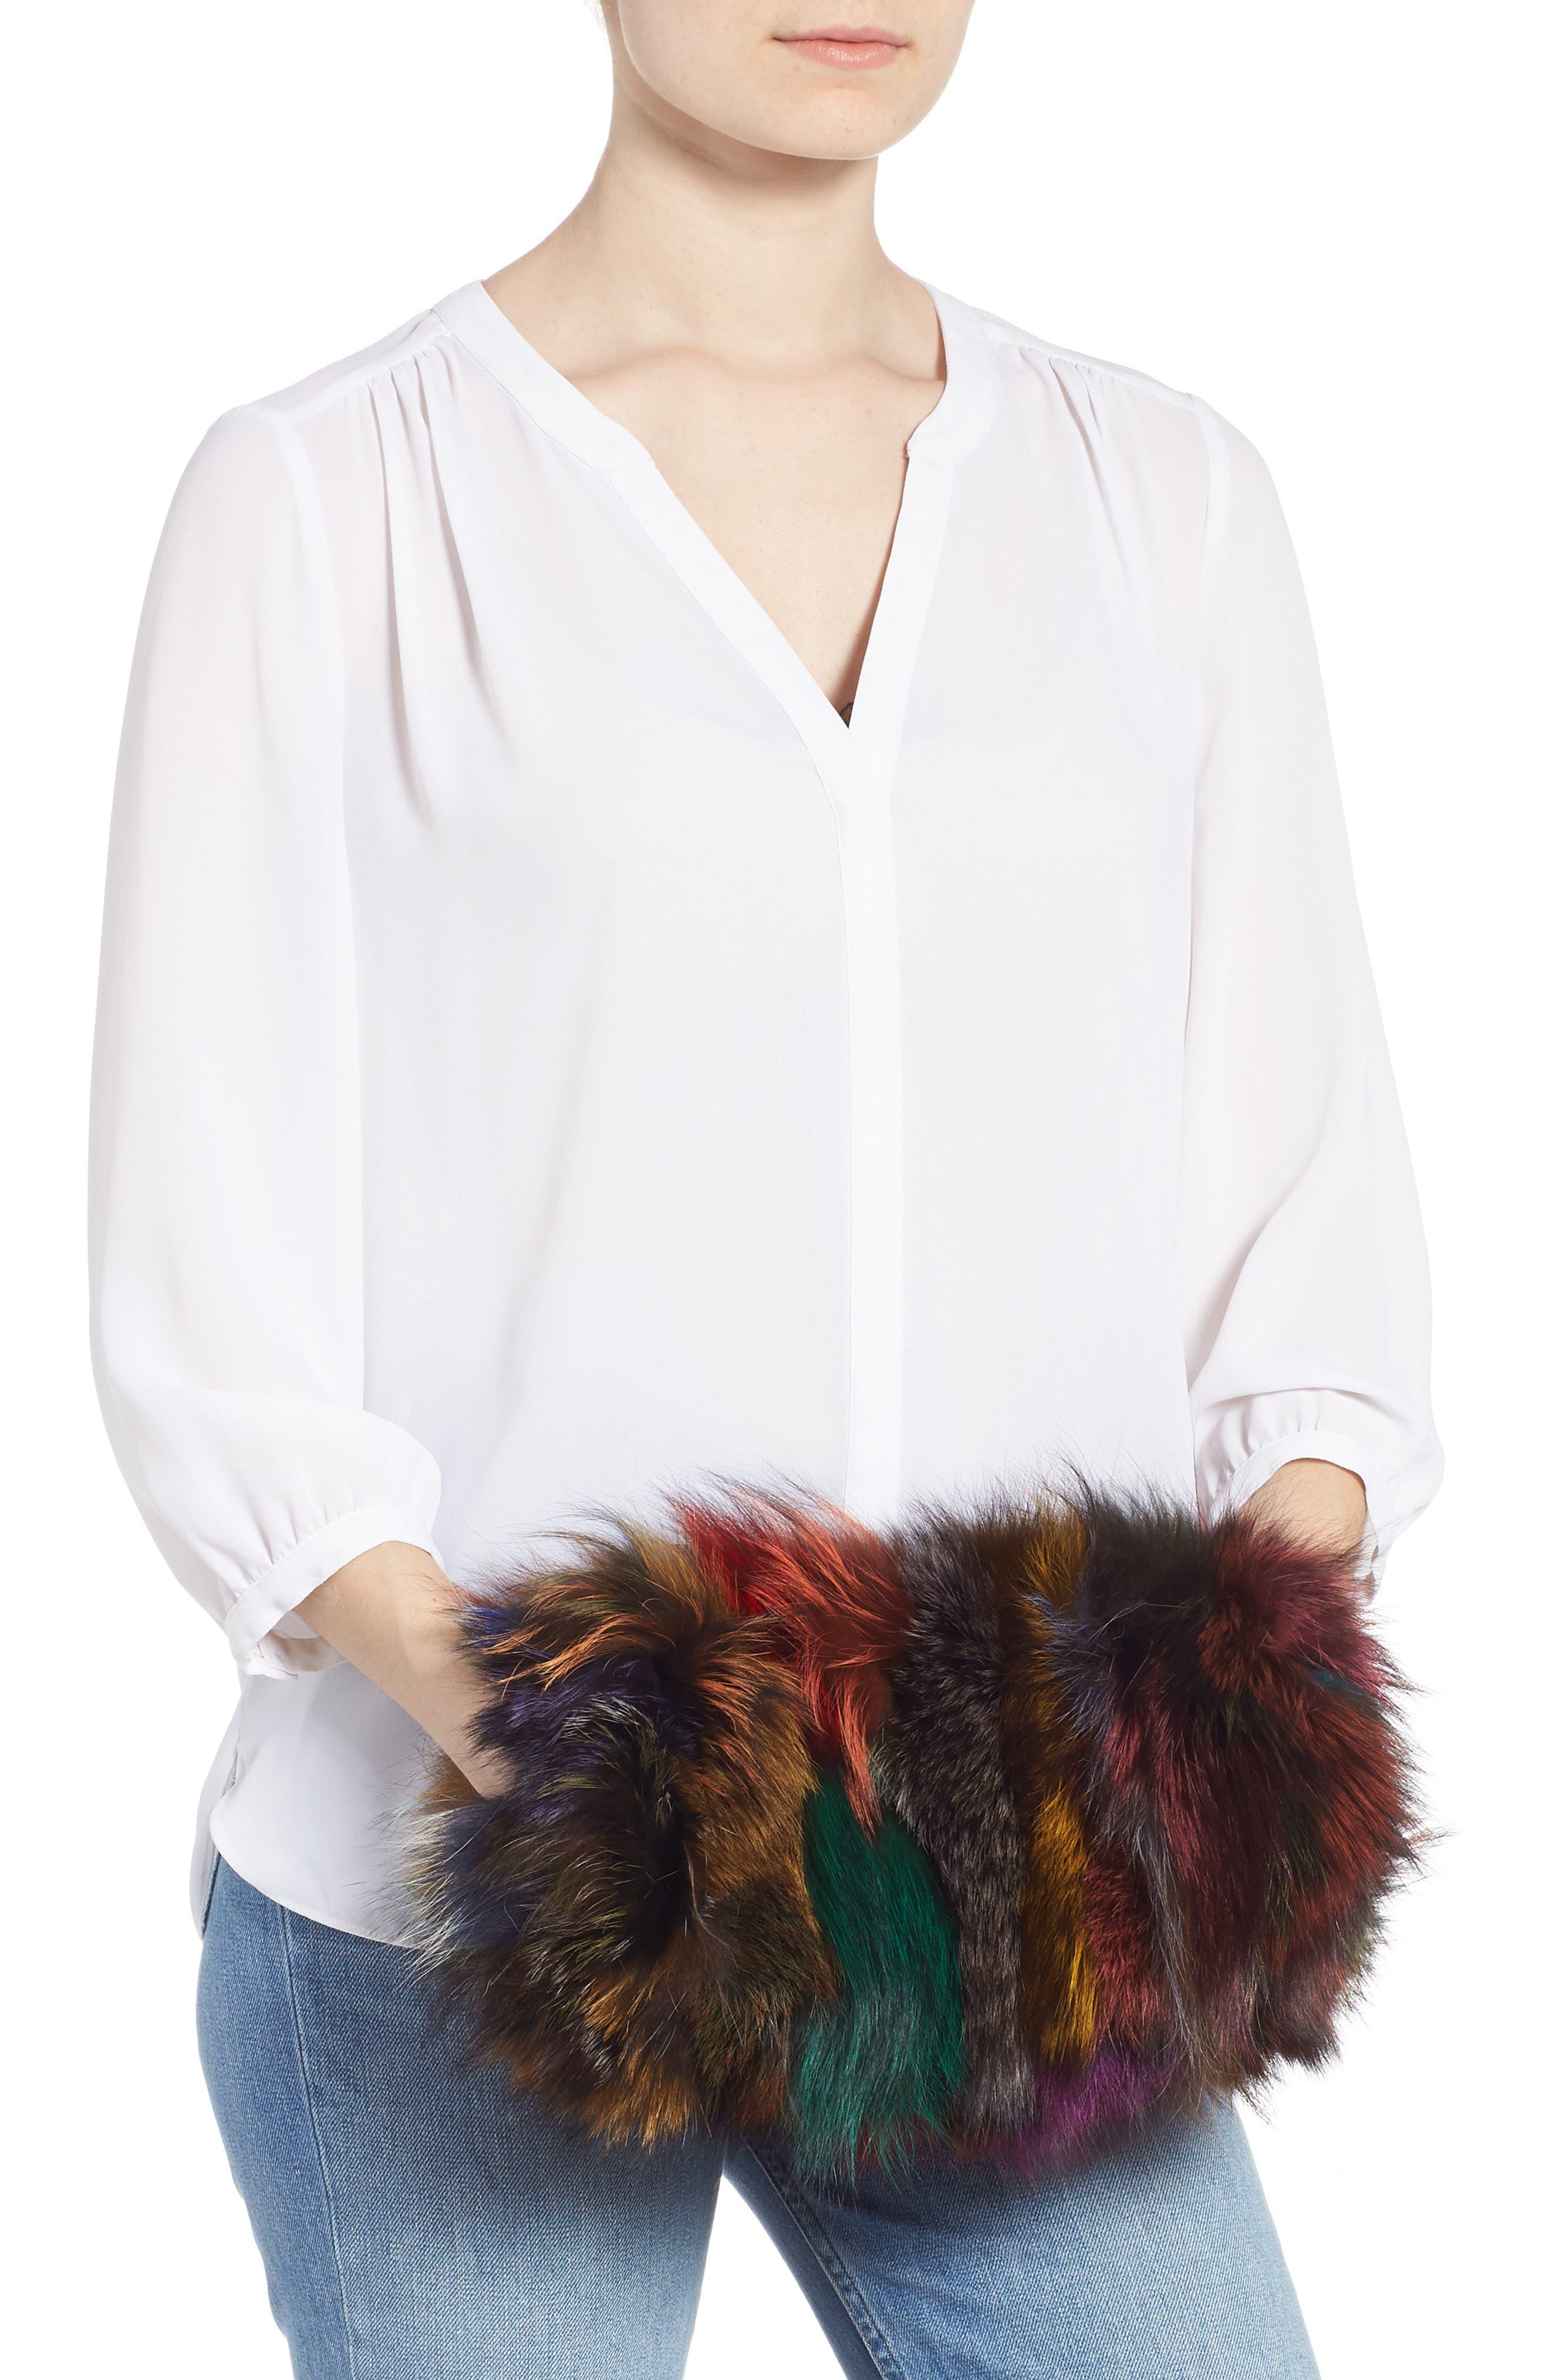 Elmo Genuine Silver Fox Fur Shoulder Bag,                             Alternate thumbnail 3, color,                             BLUE MULTI